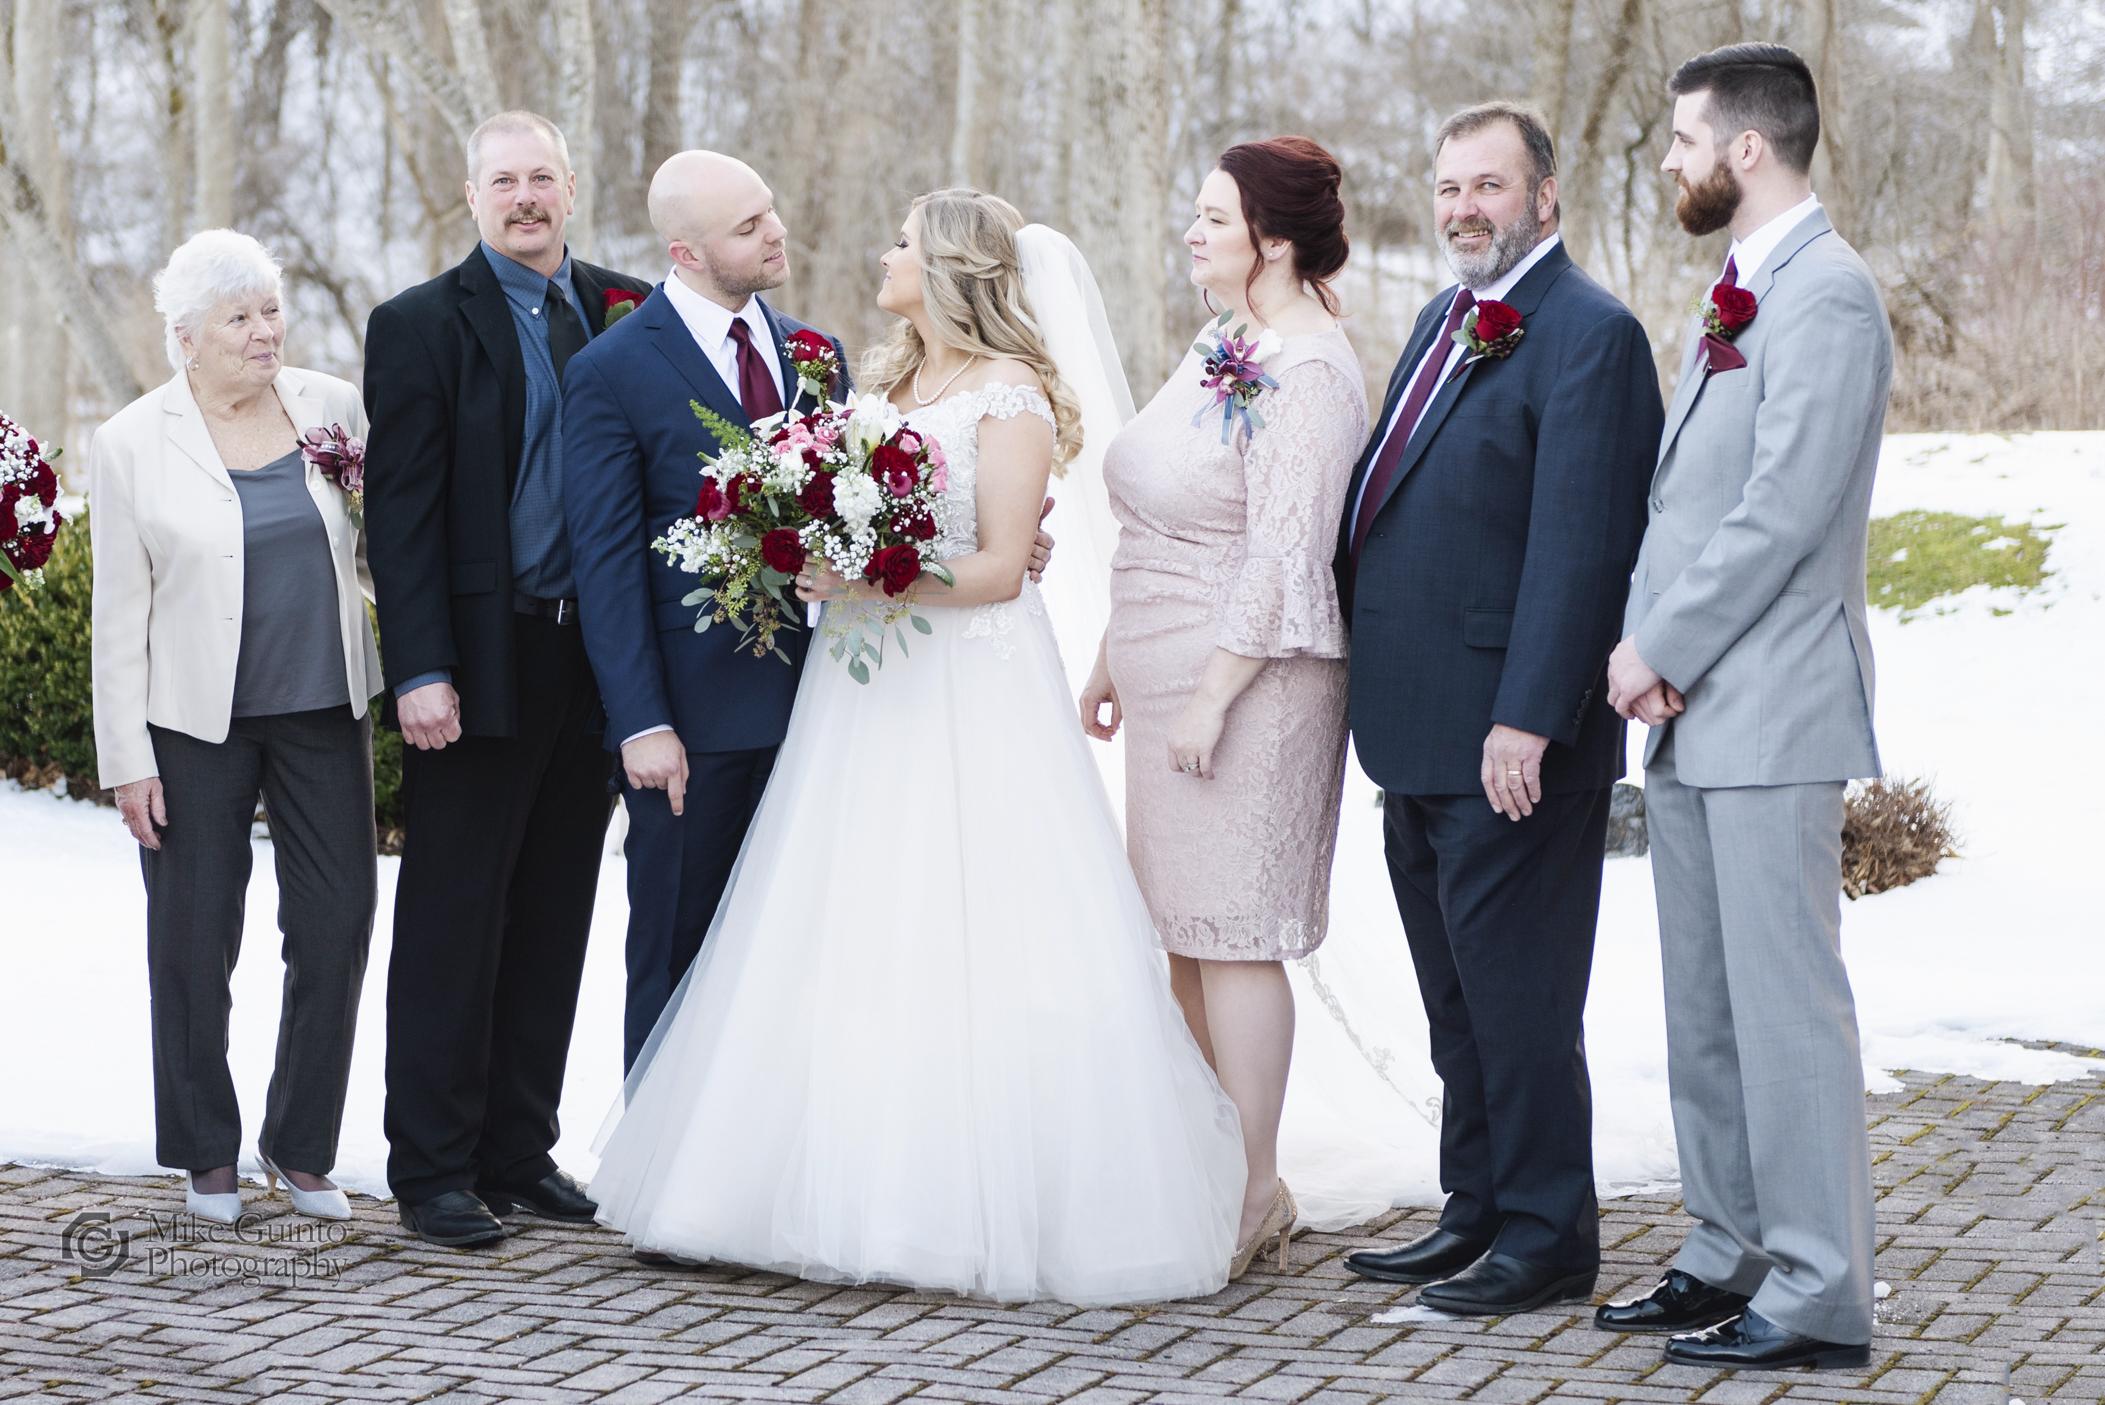 20190223_Wedding_Jaworski_323.jpg